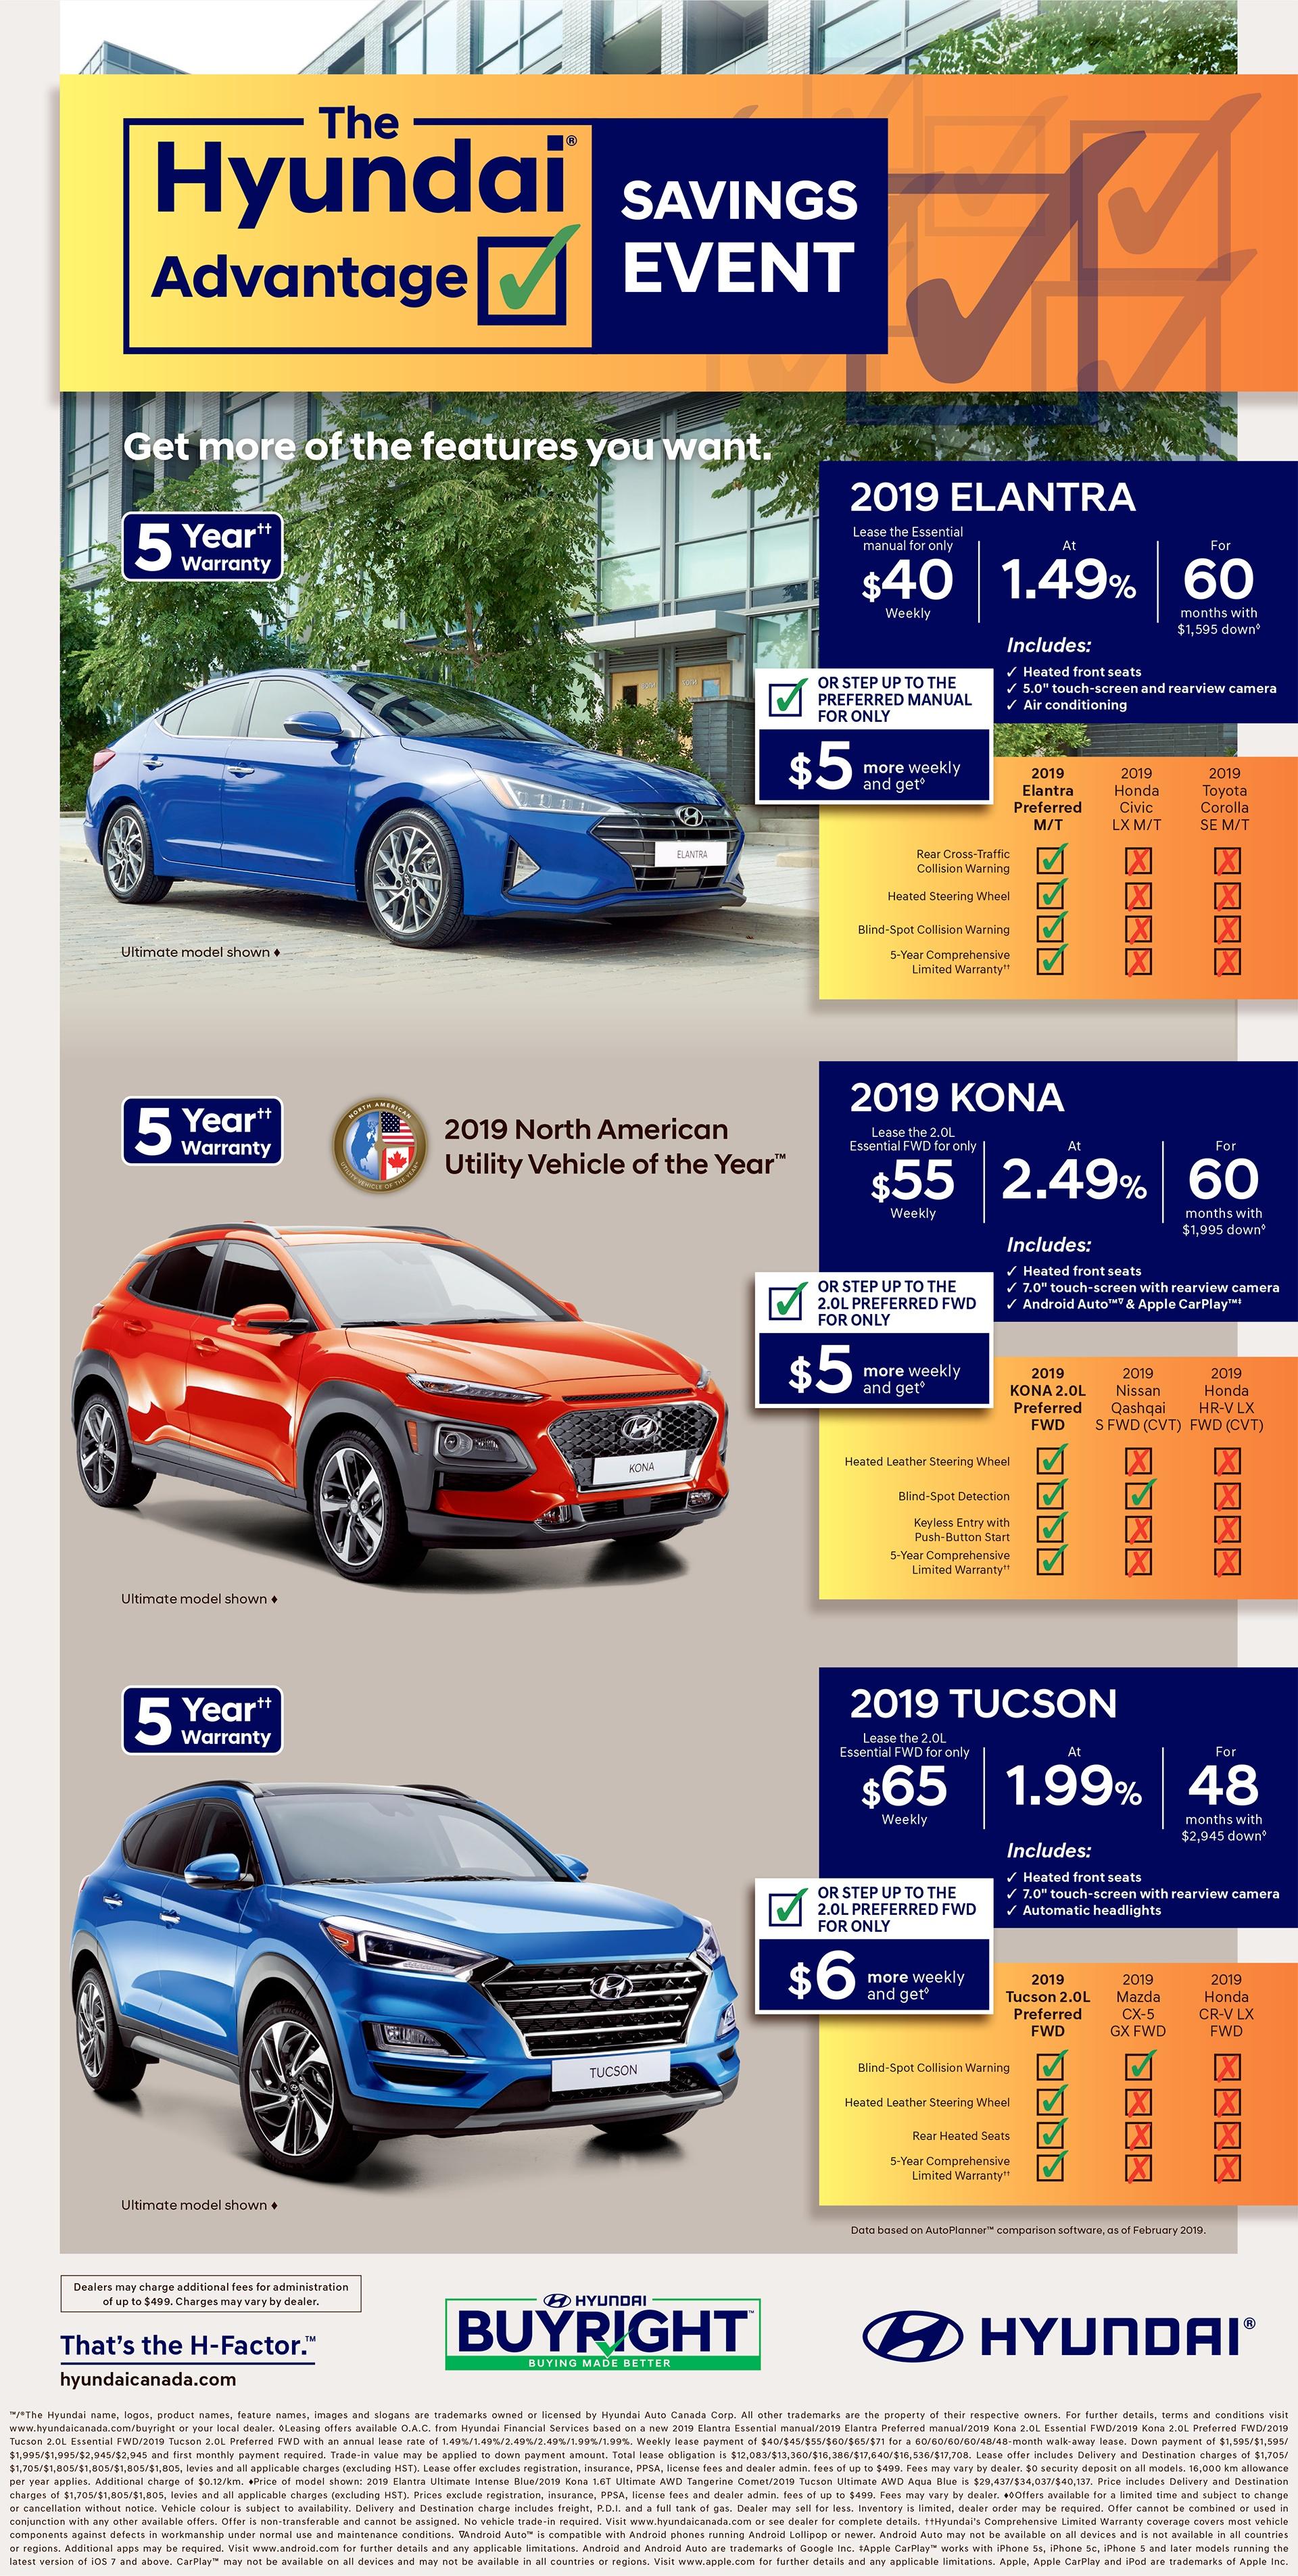 Hyundai Advantage Saving Event